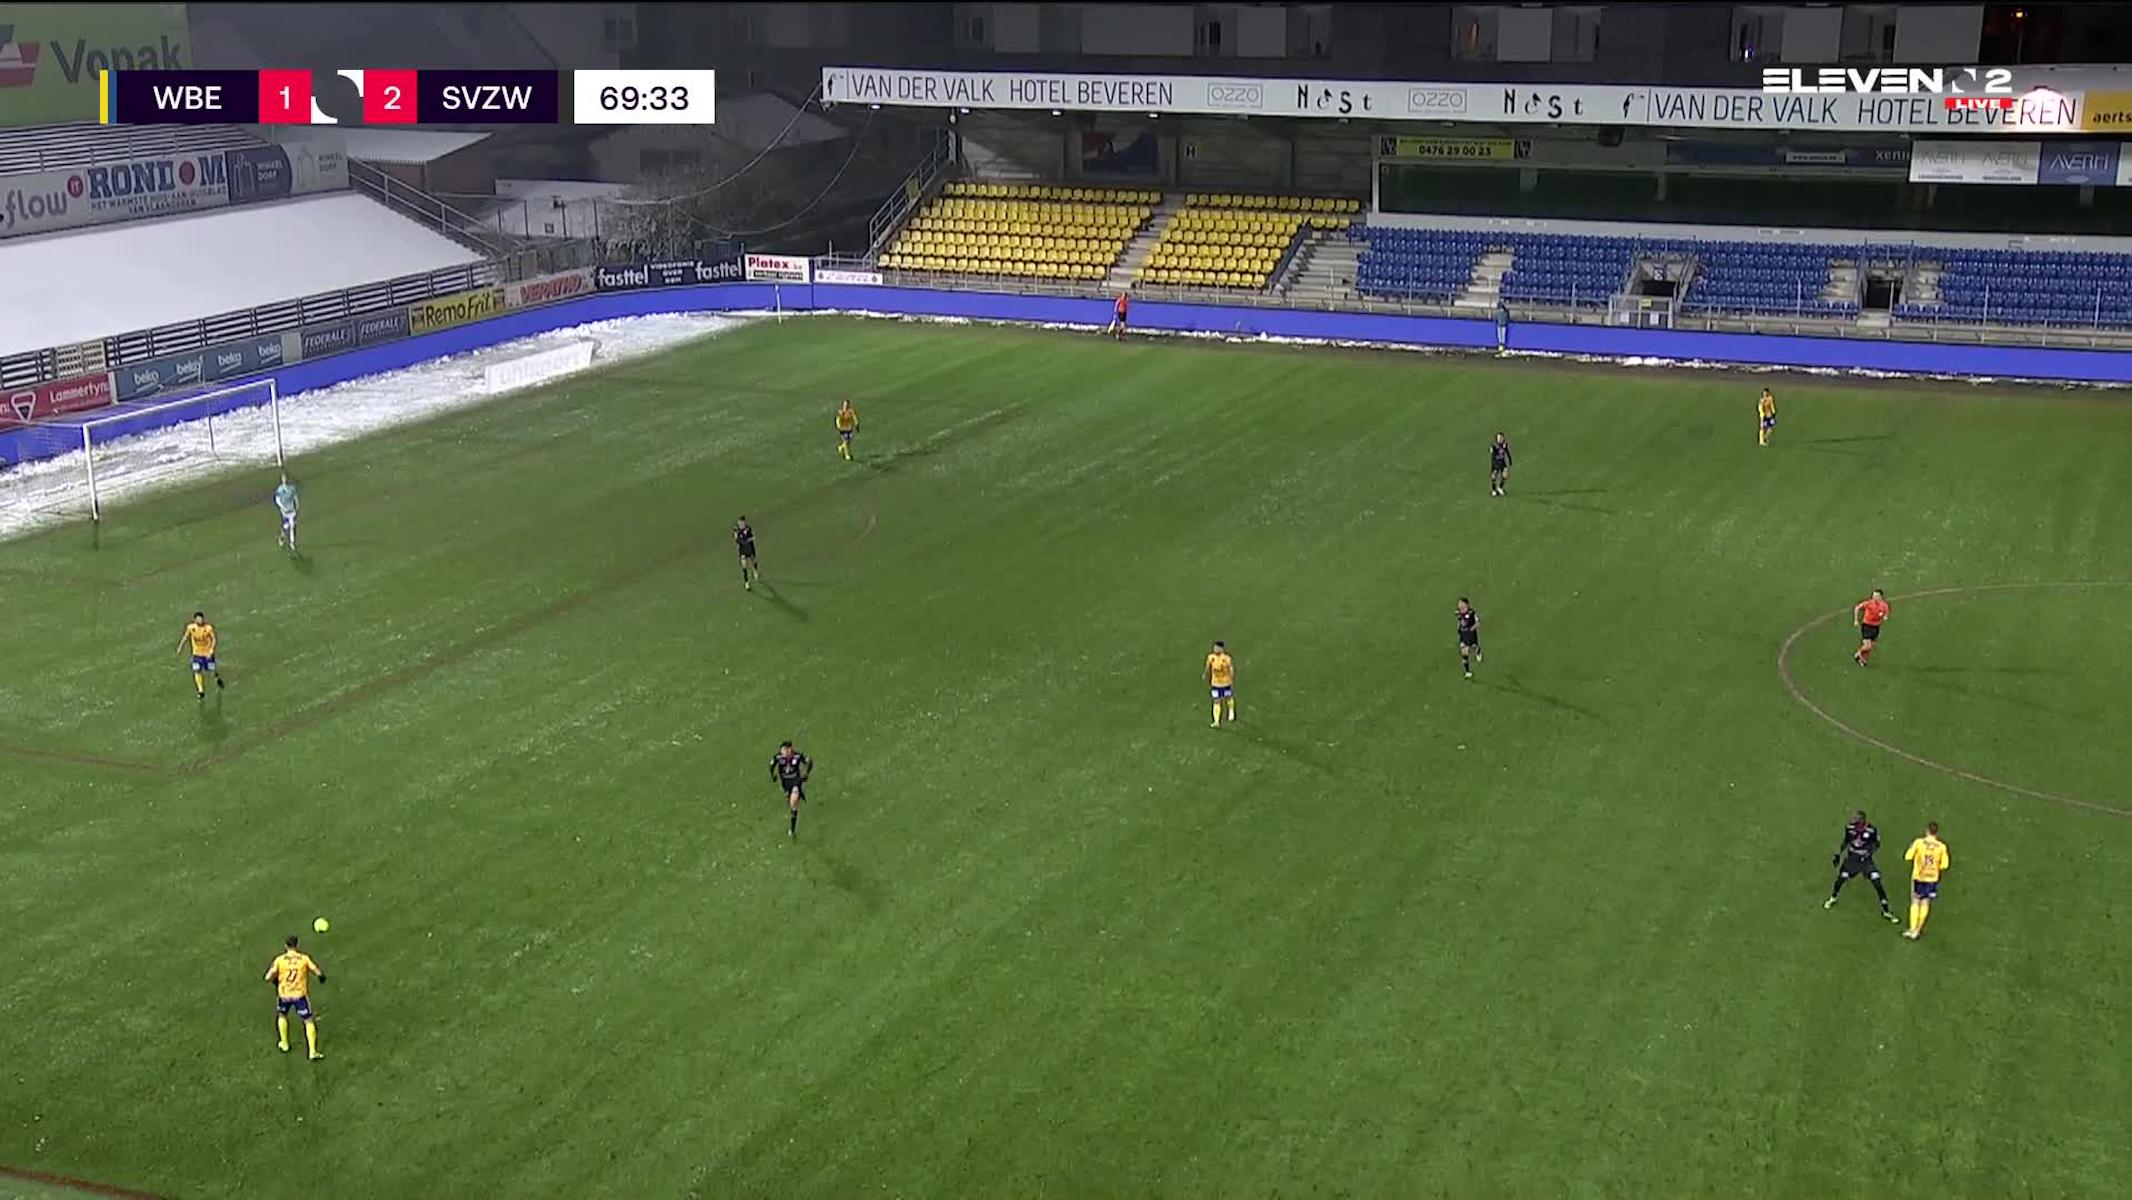 Doelpunt Gianni Bruno (Waasland-Beveren vs. SV Zulte Waregem)